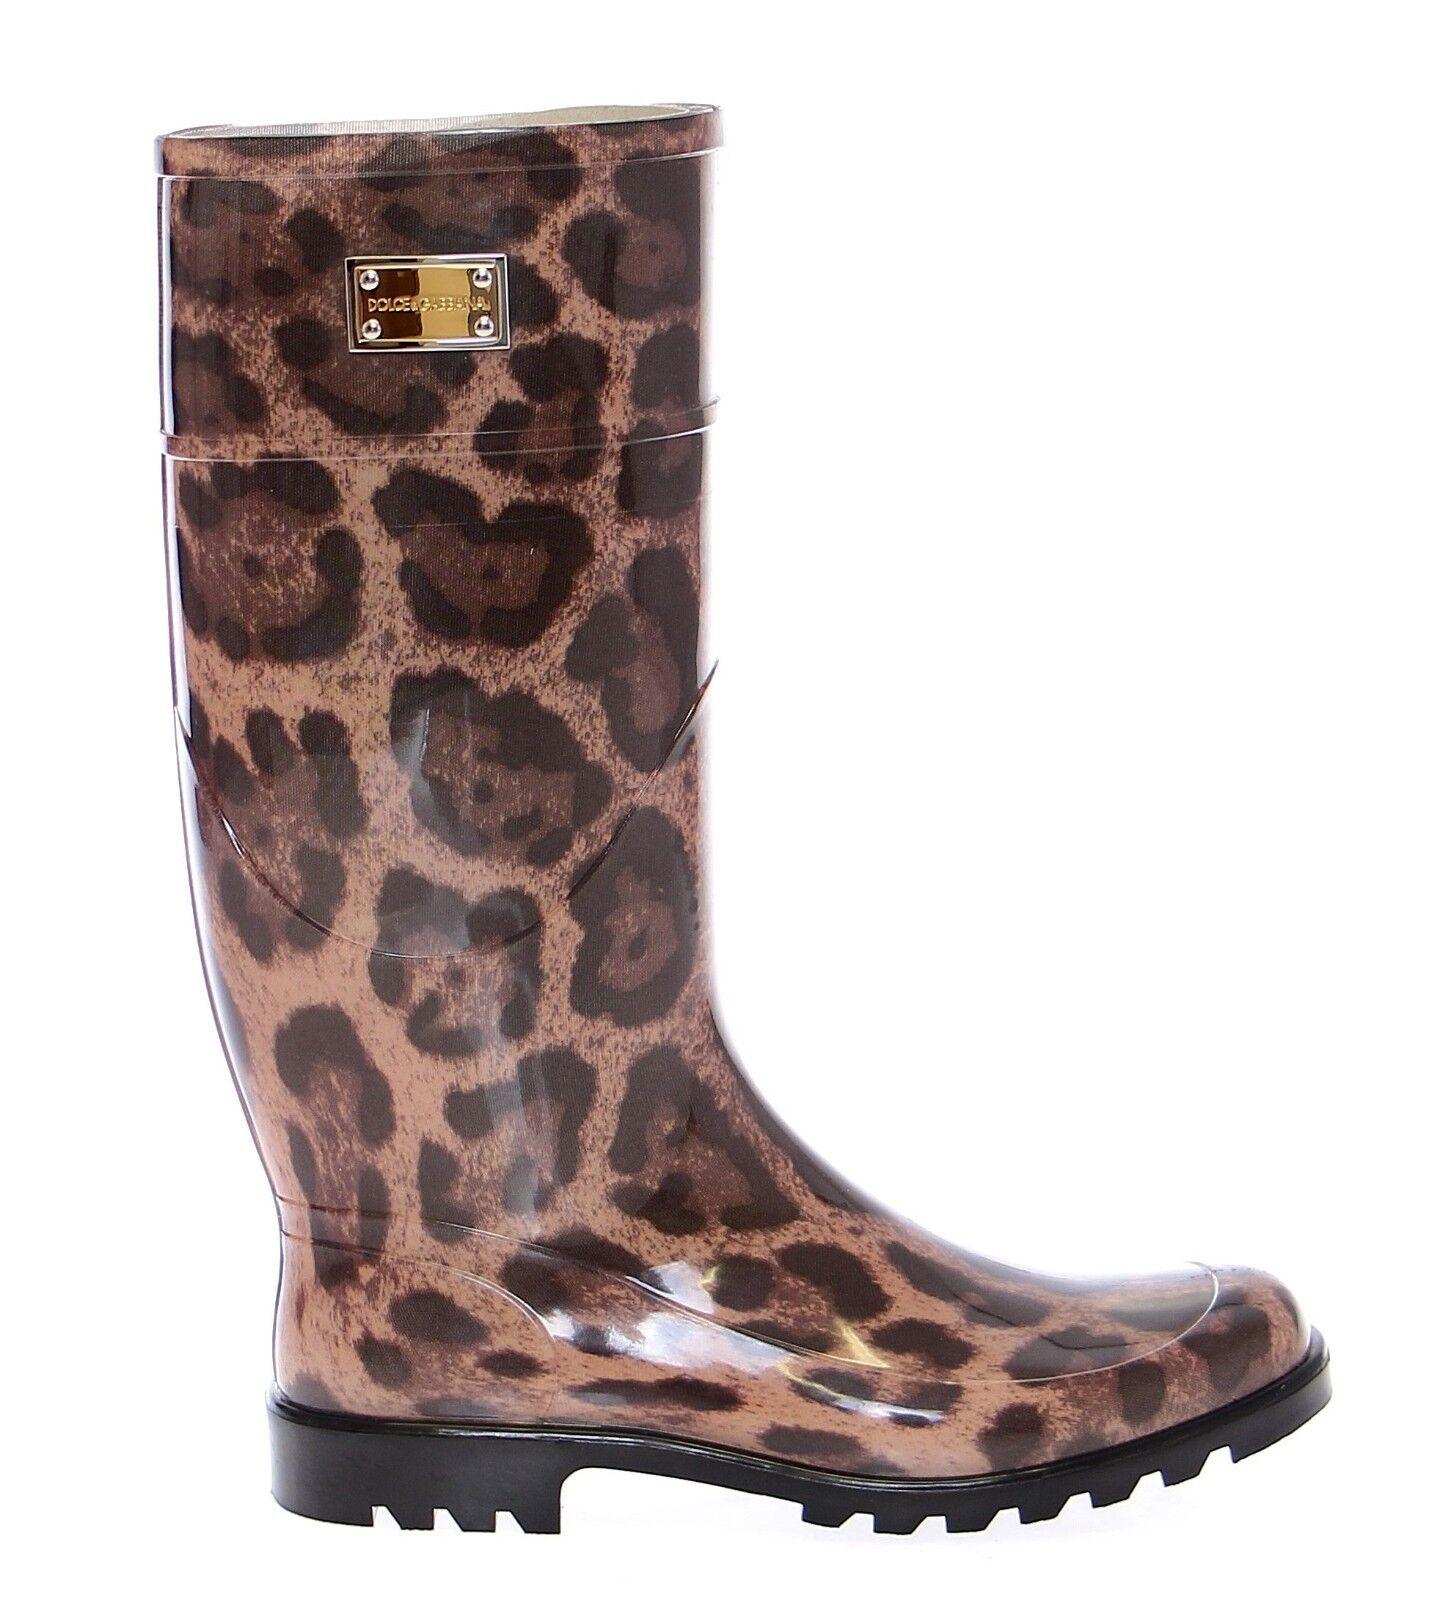 modelo más vendido de la marca Nuevo con Etiqueta Dolce Gabbana & Gabbana Dolce Leopardo Gomilla Botas de Lluvia Stivali S 10f1dd